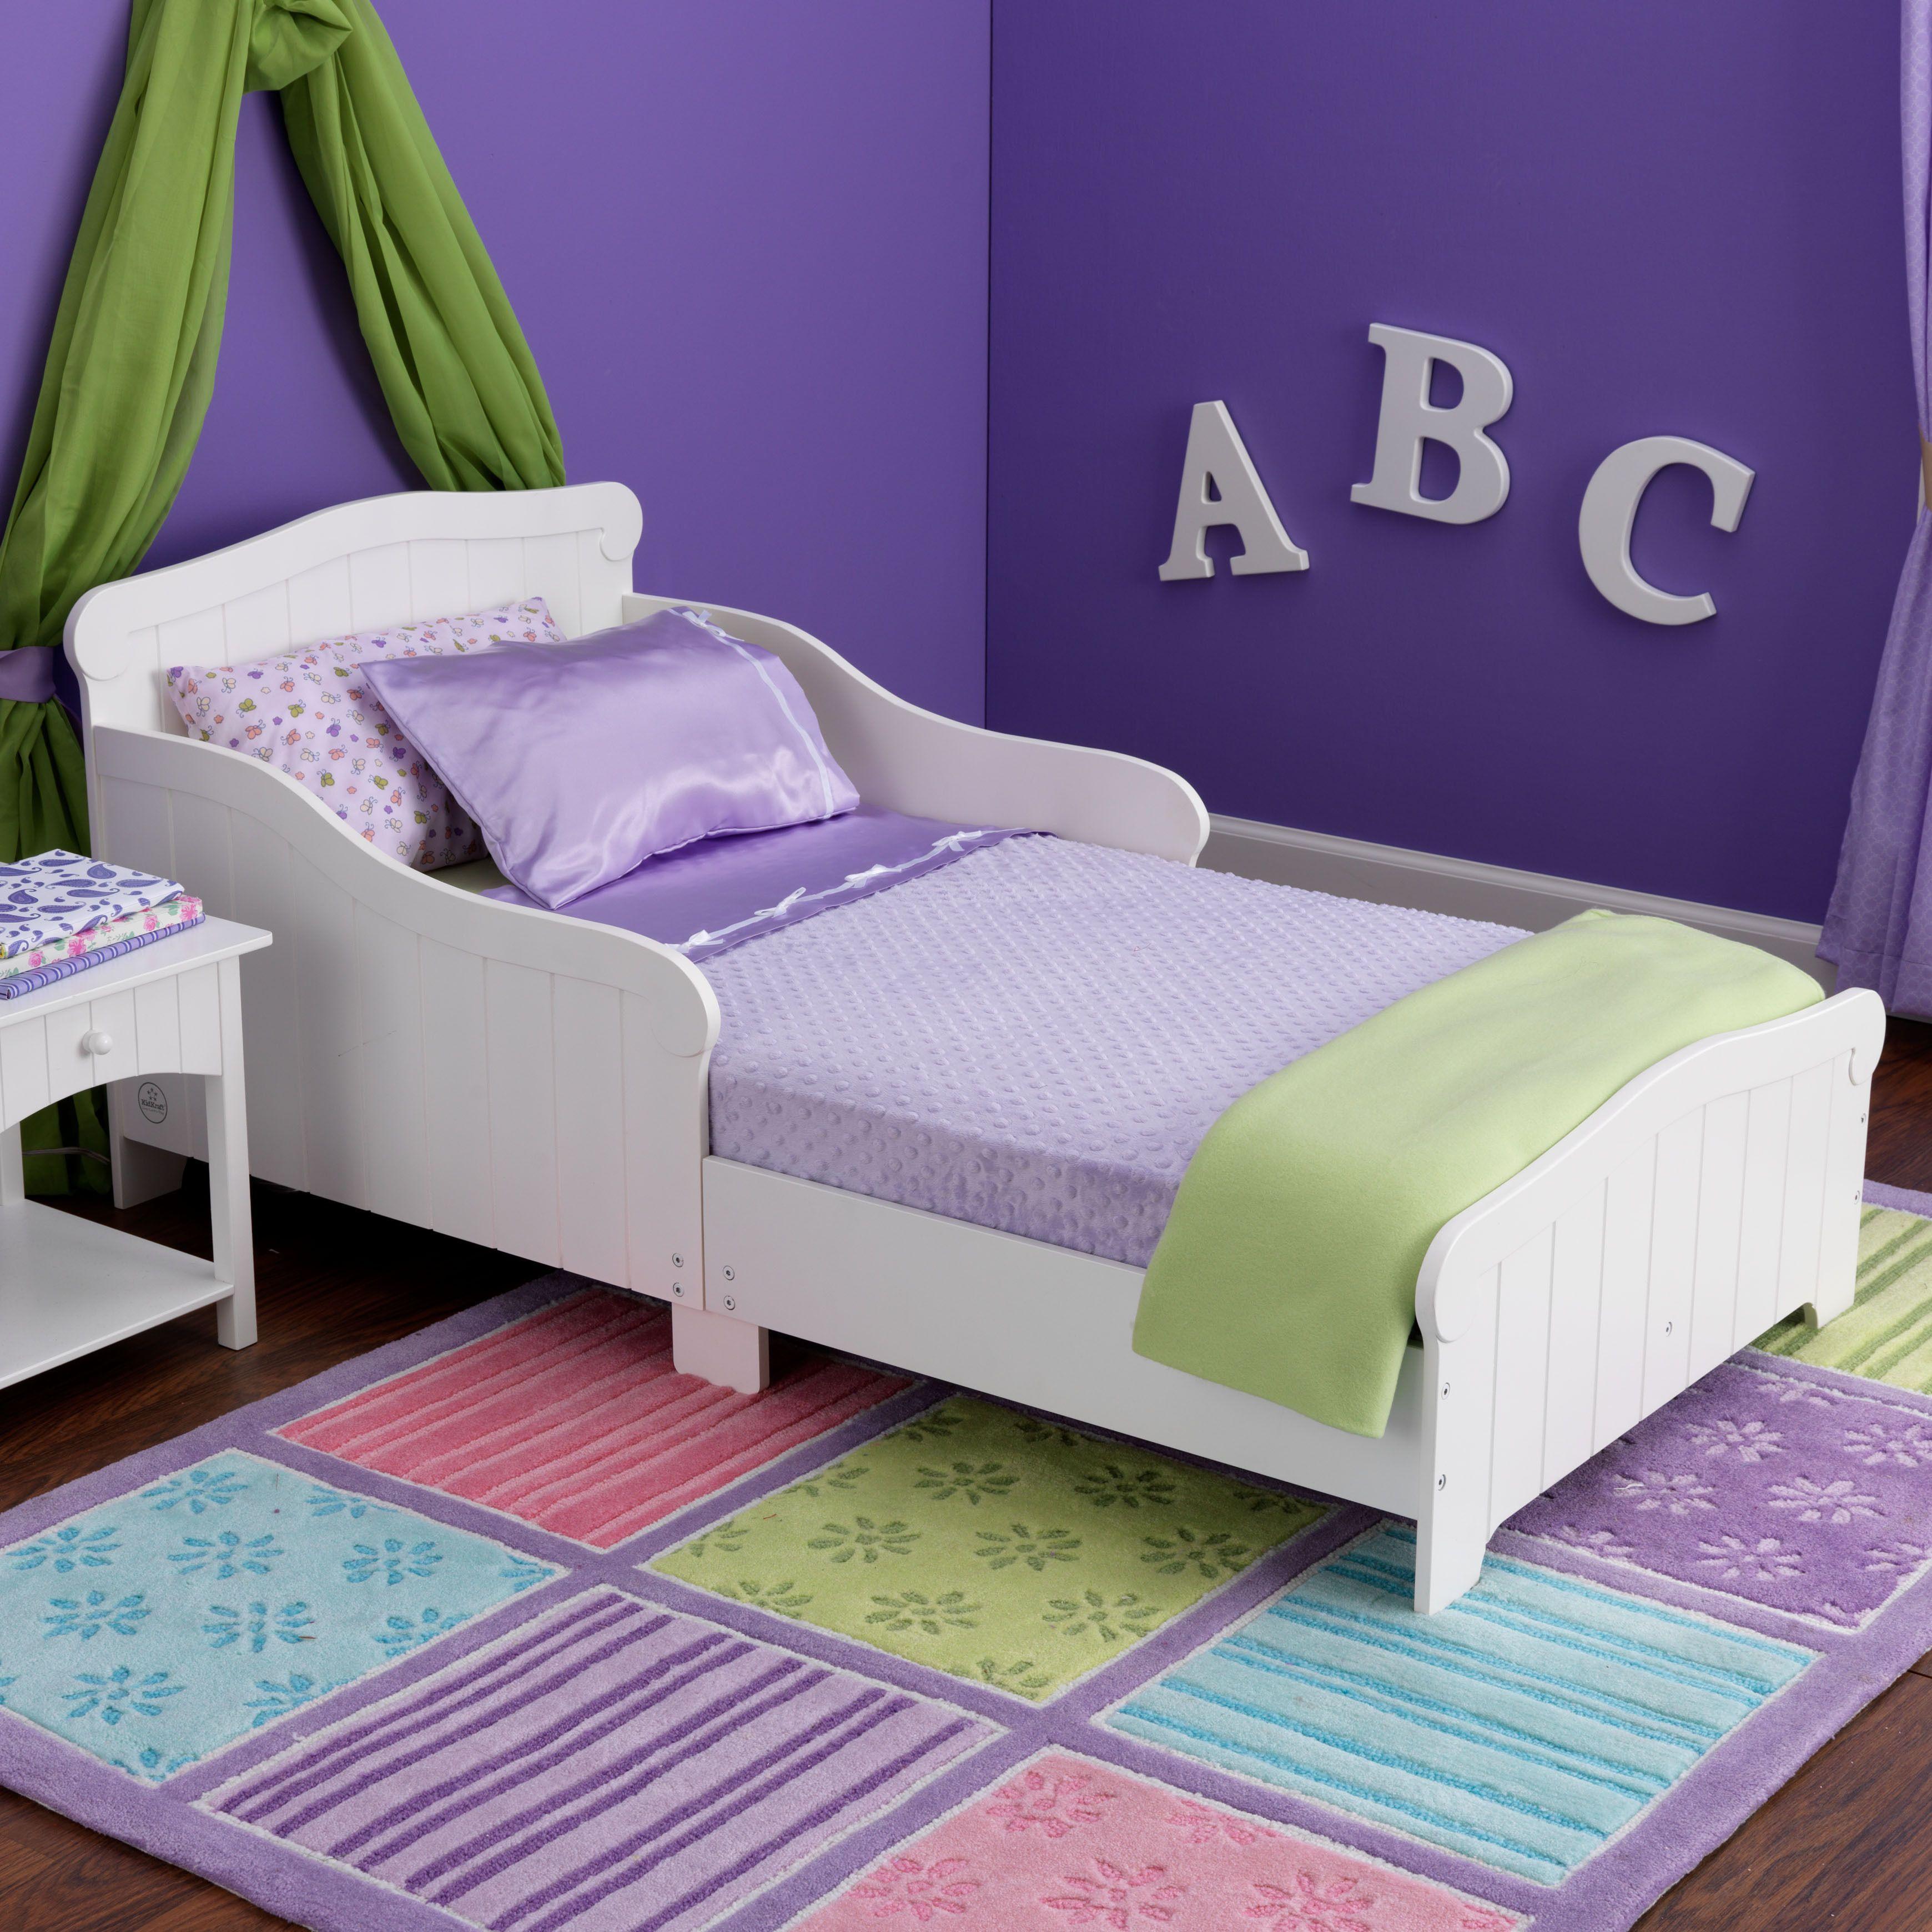 KidKraft Nantucket White Toddler Bed By